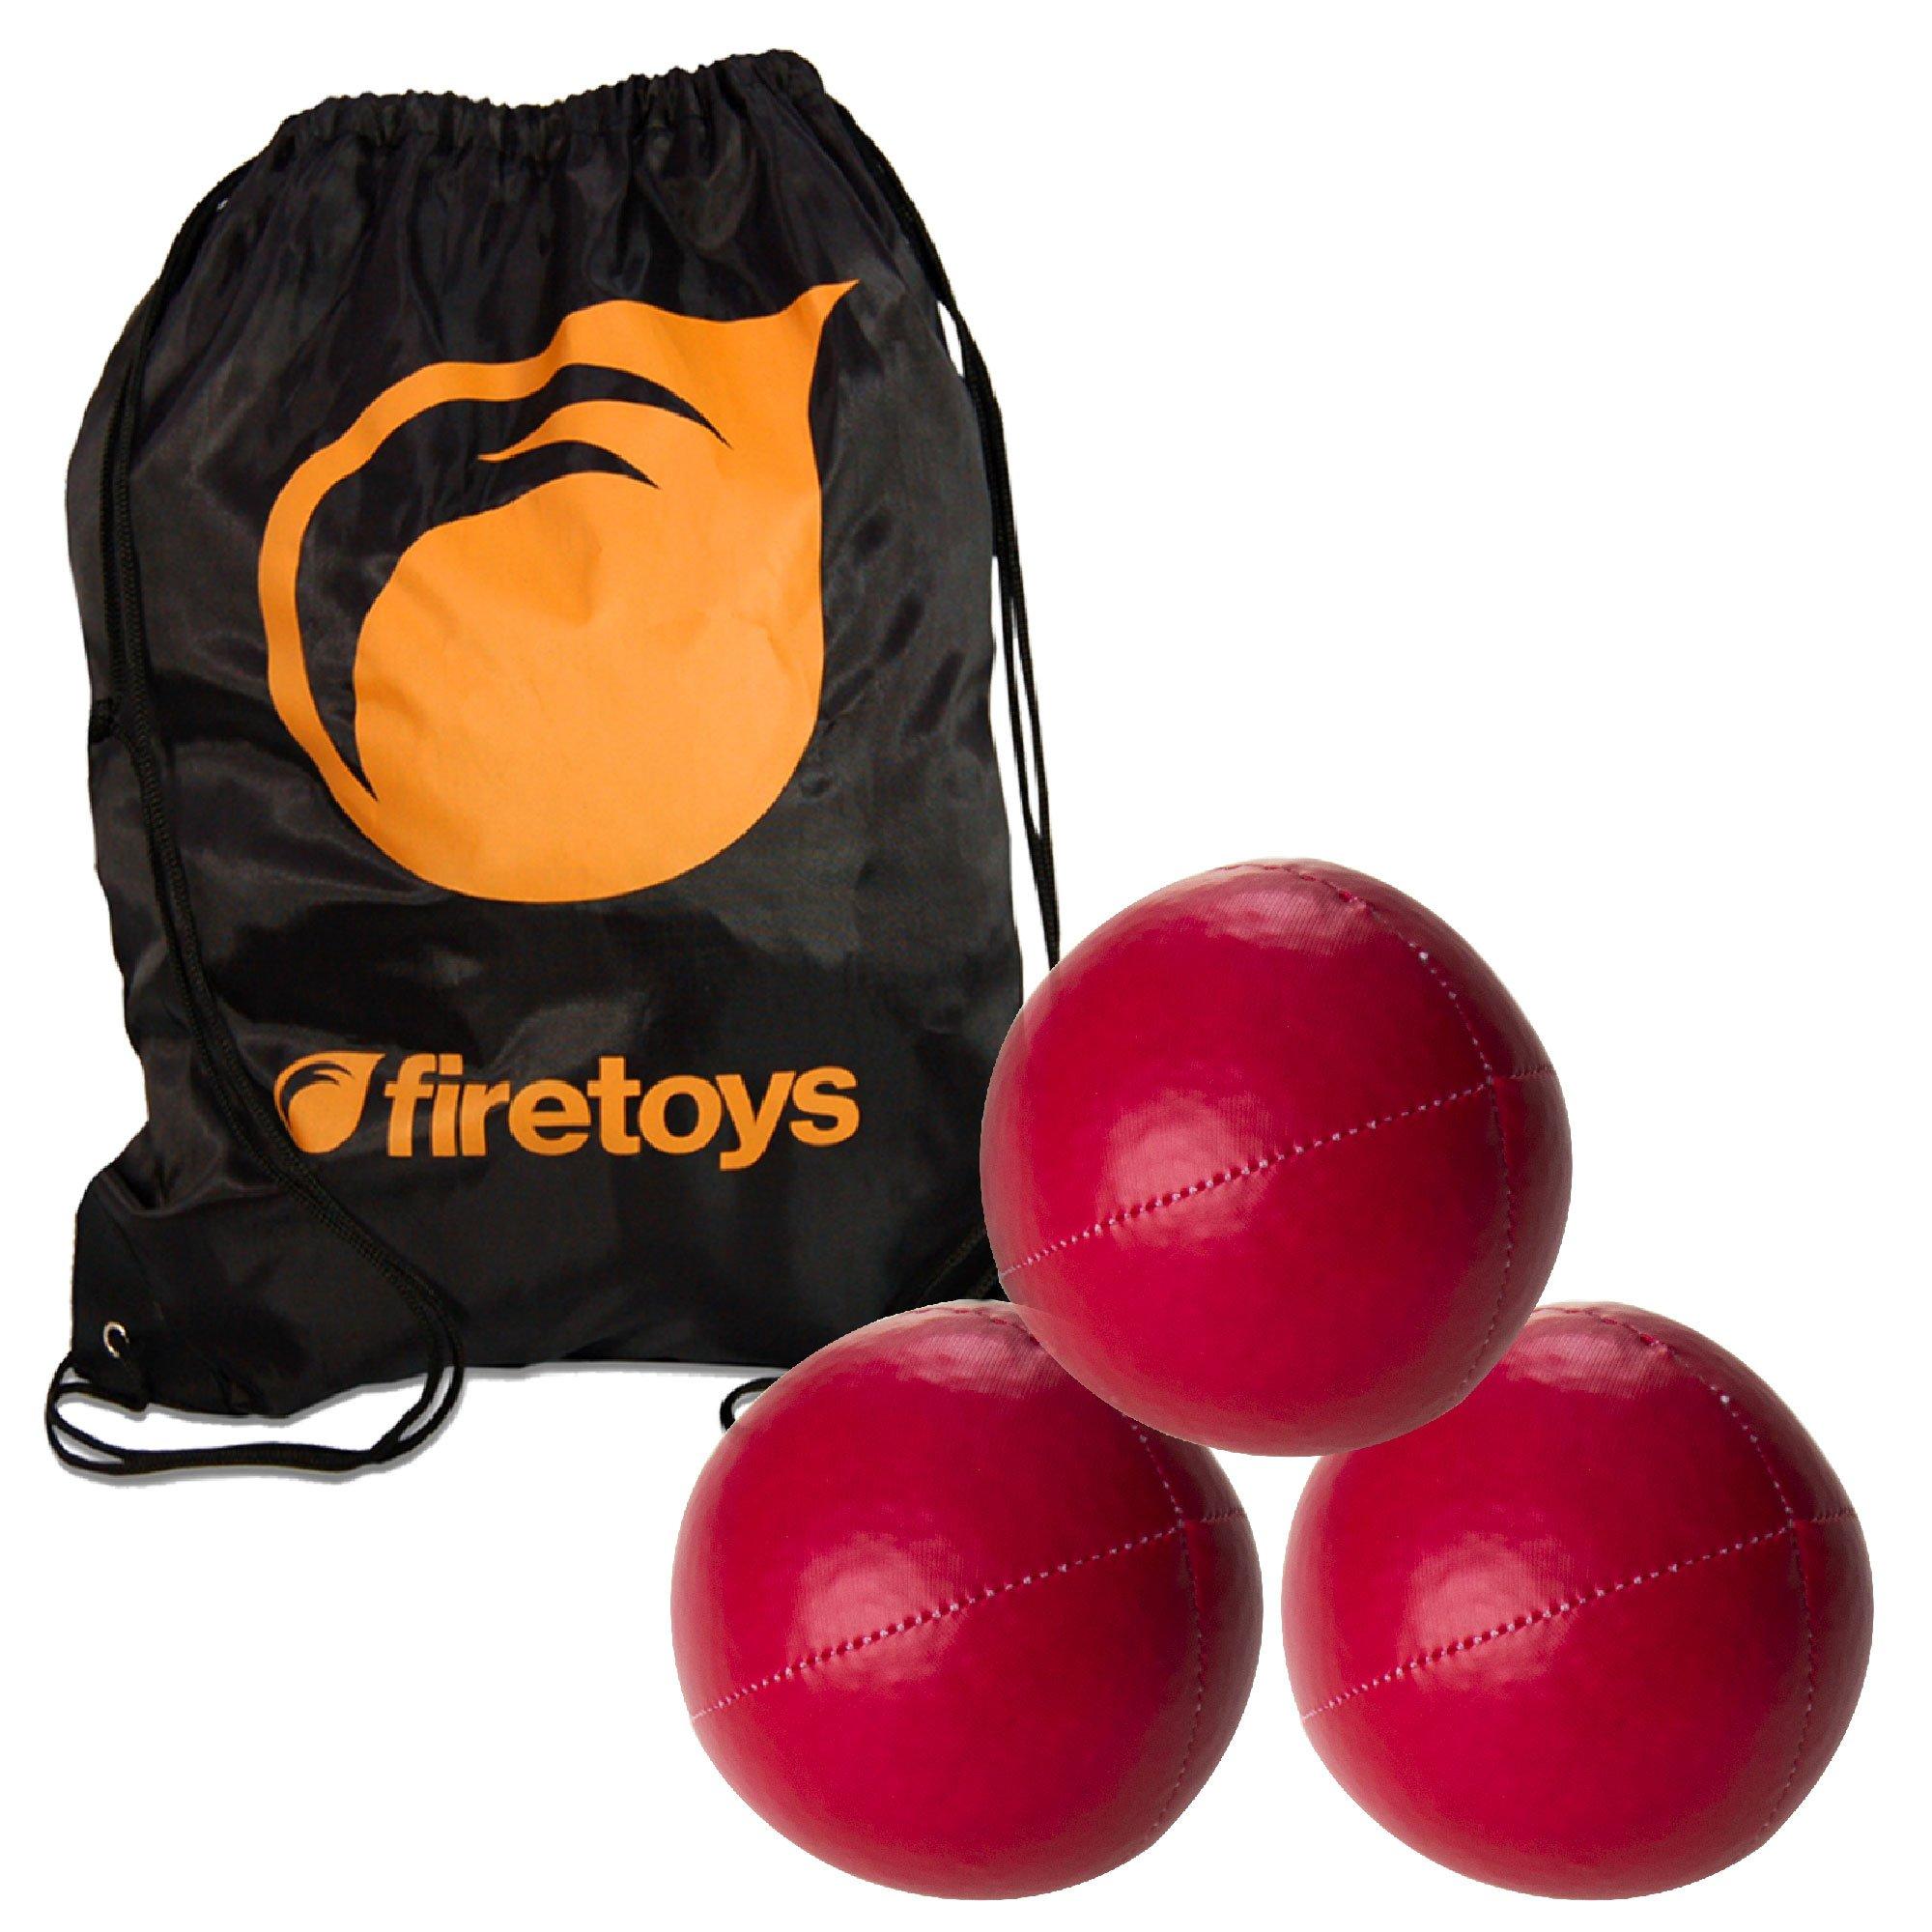 Juggling Ball Set - 3X Red Juggling Balls & Firetoys Bag